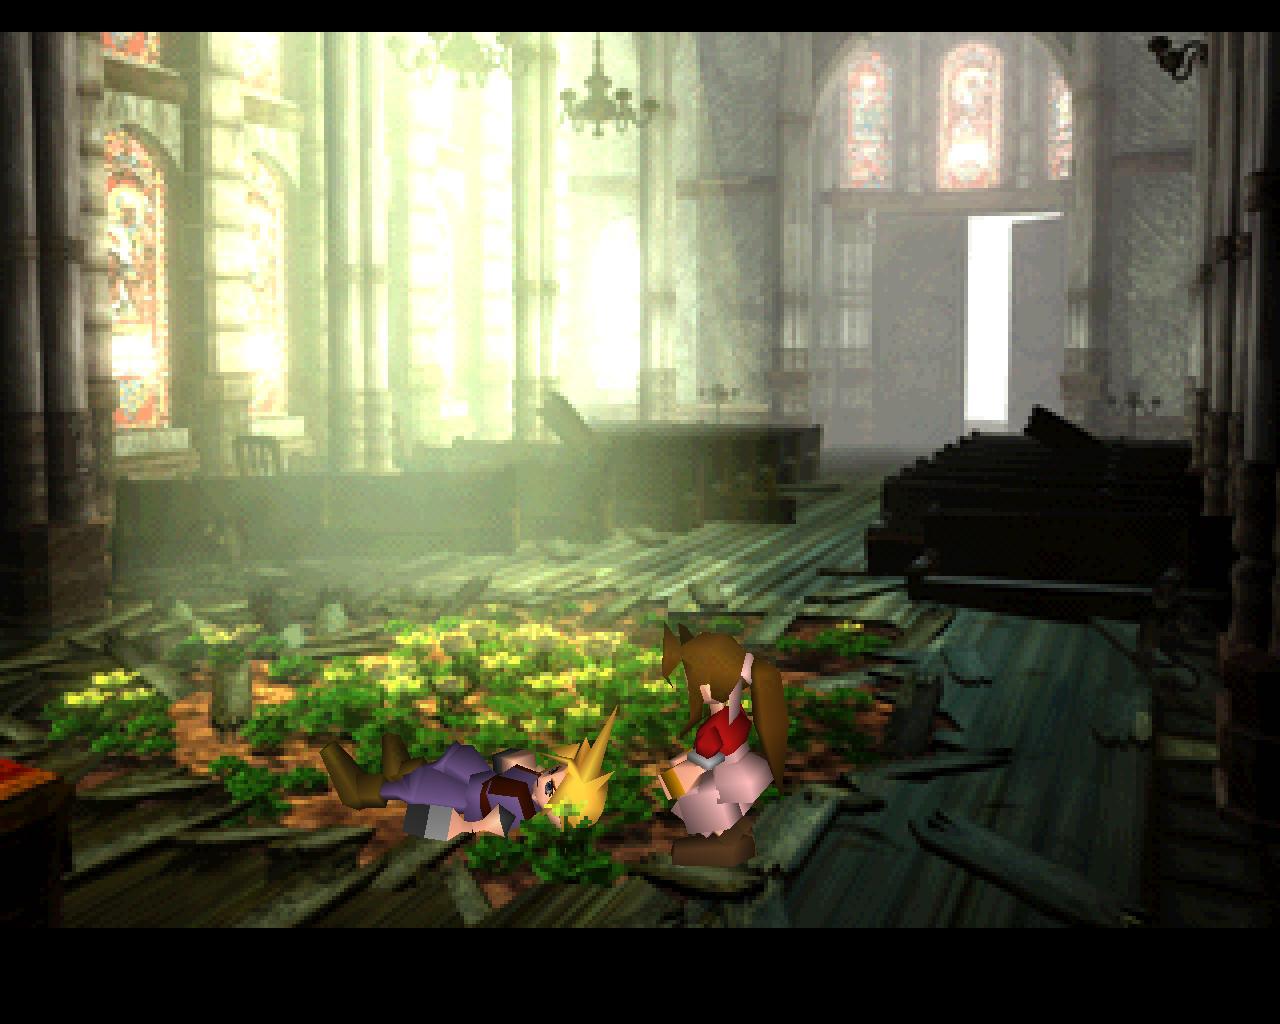 final-fantasy-vii-screenshot-vii-cloud-church-flowers.jpg